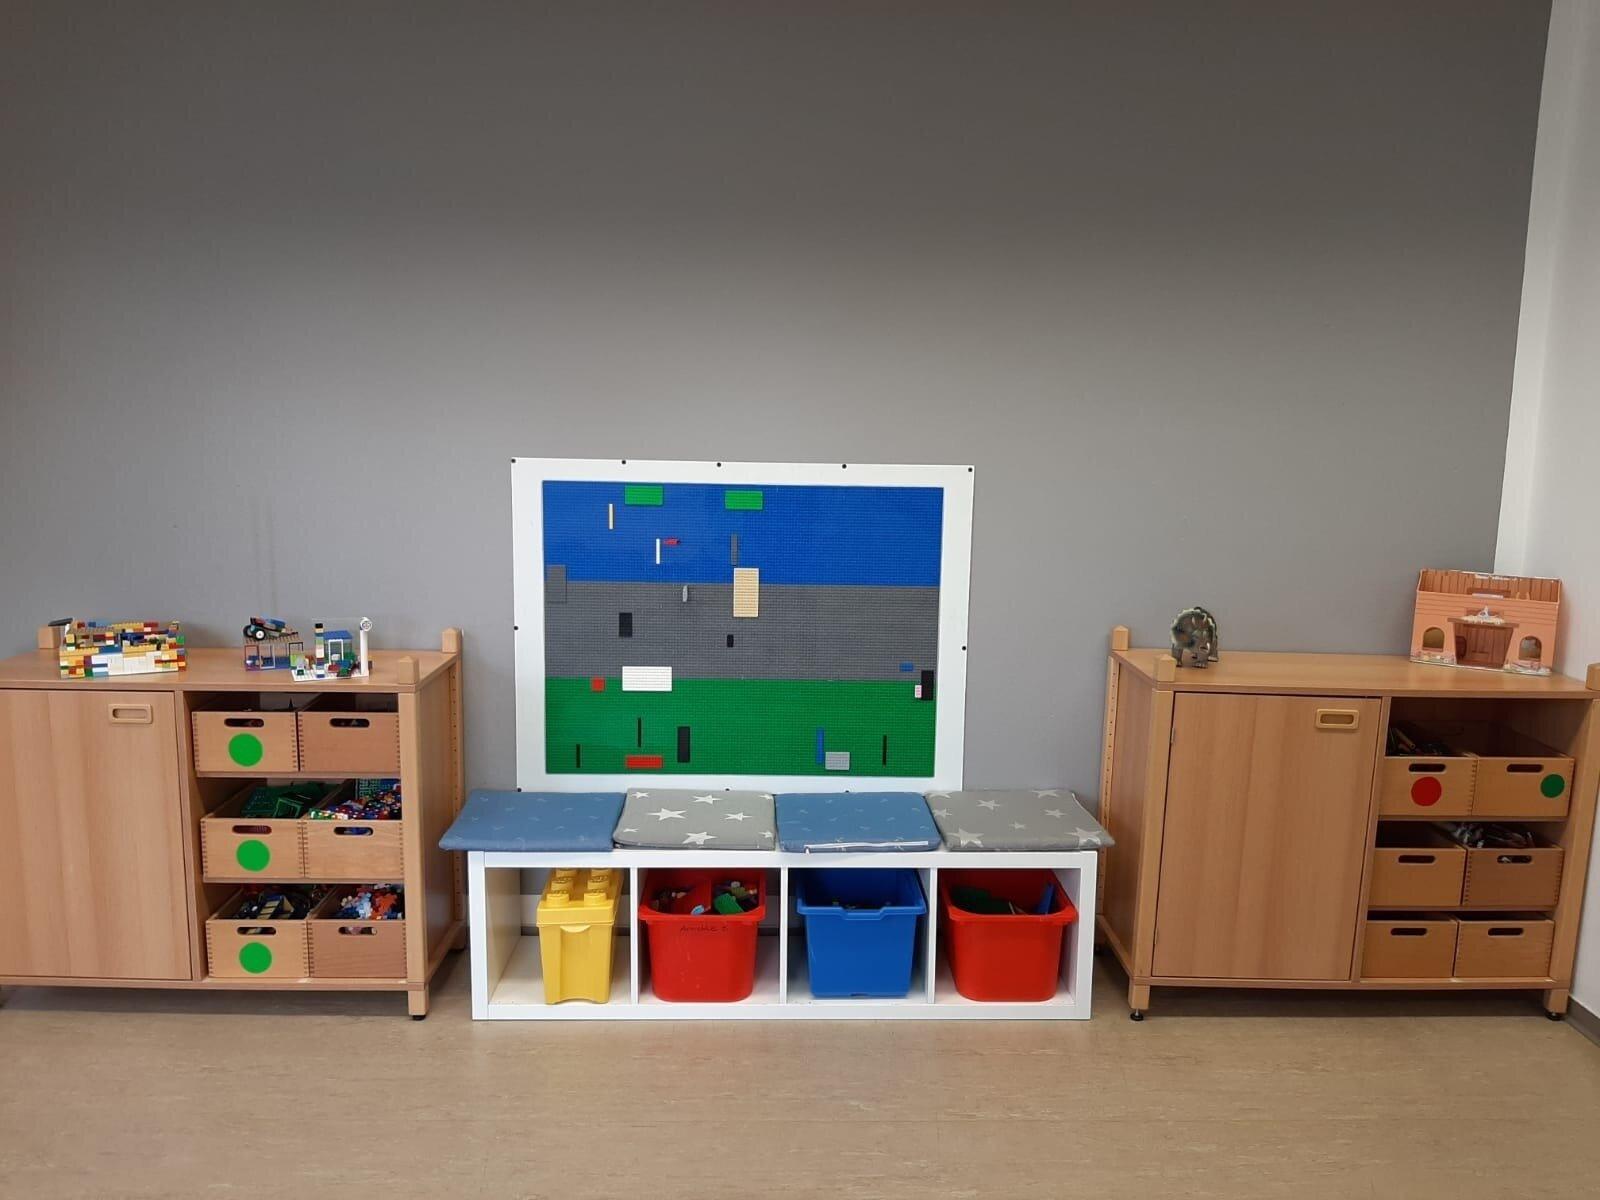 Gruppenraum 1 Lego-Wand